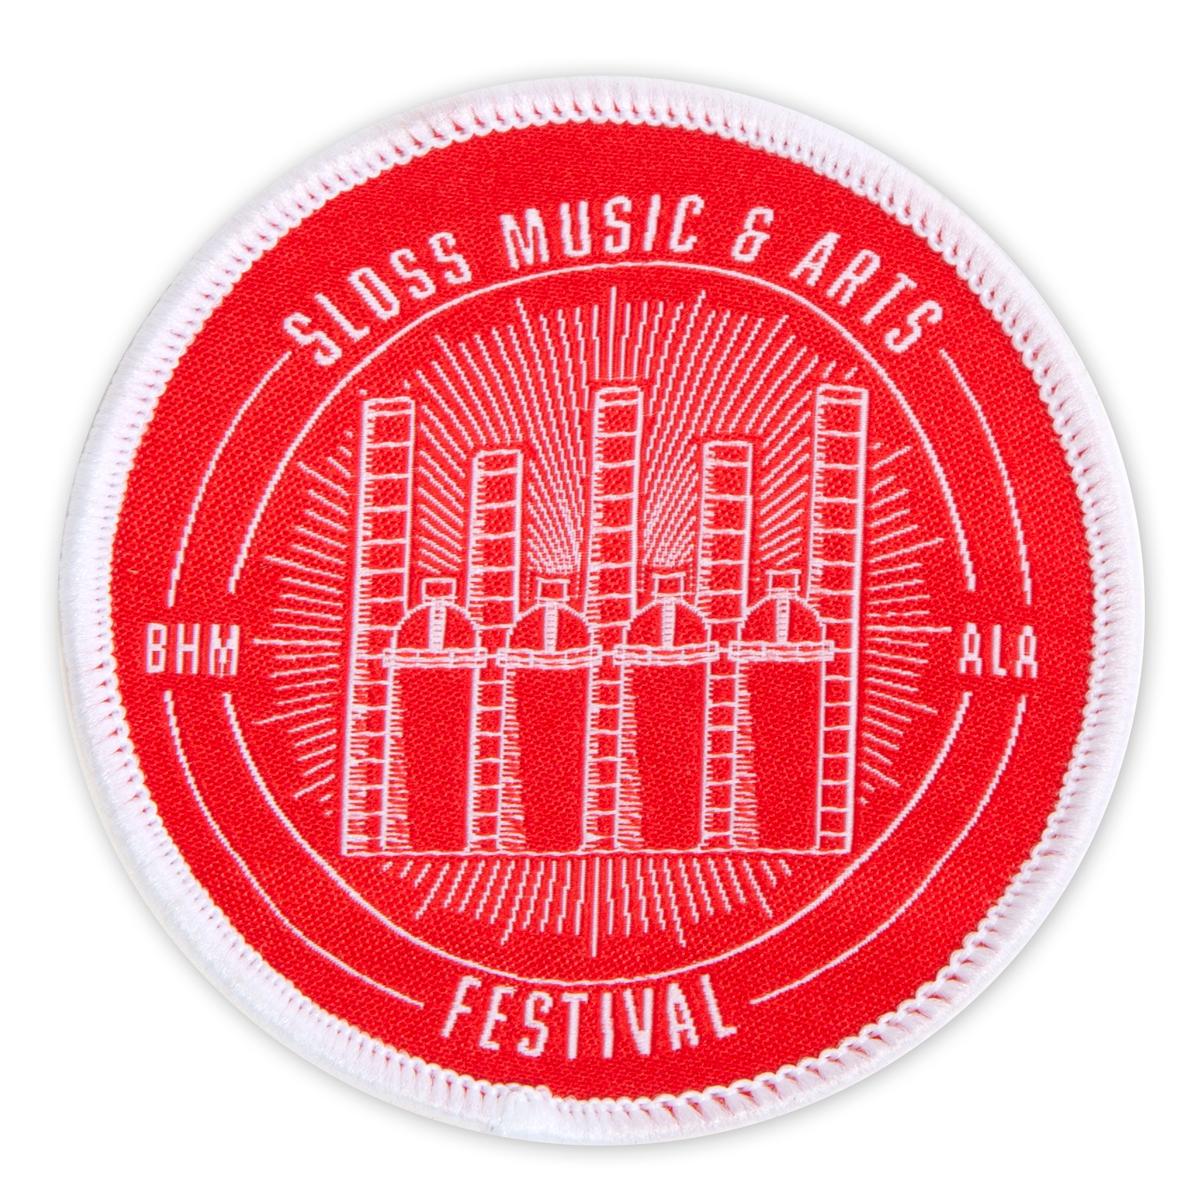 Sloss Music & Arts Festival 2018 Patch